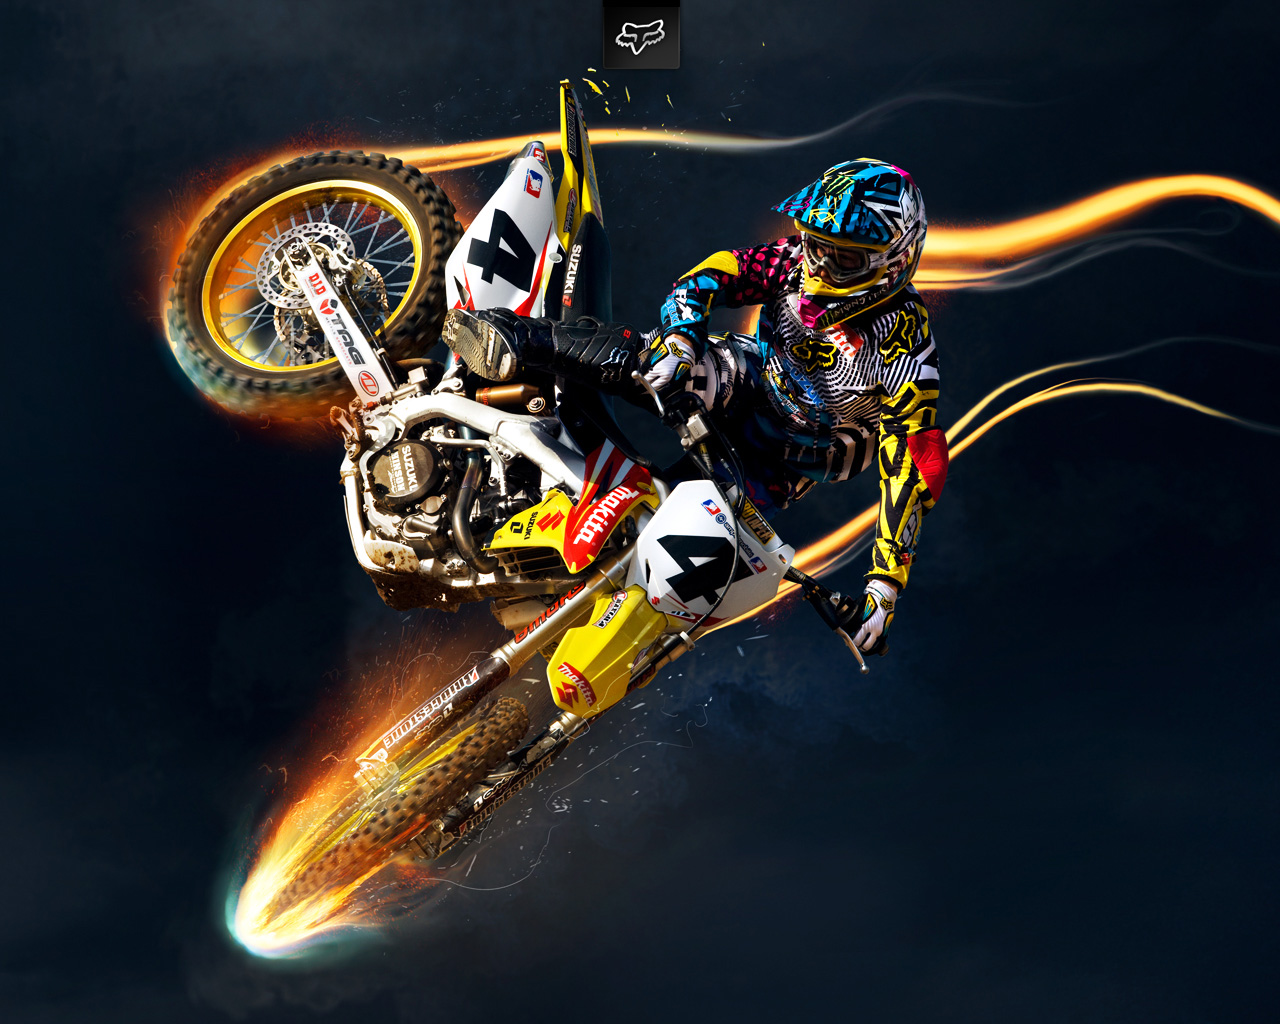 Thema Coole Motocross Wallpaper 1280x1024